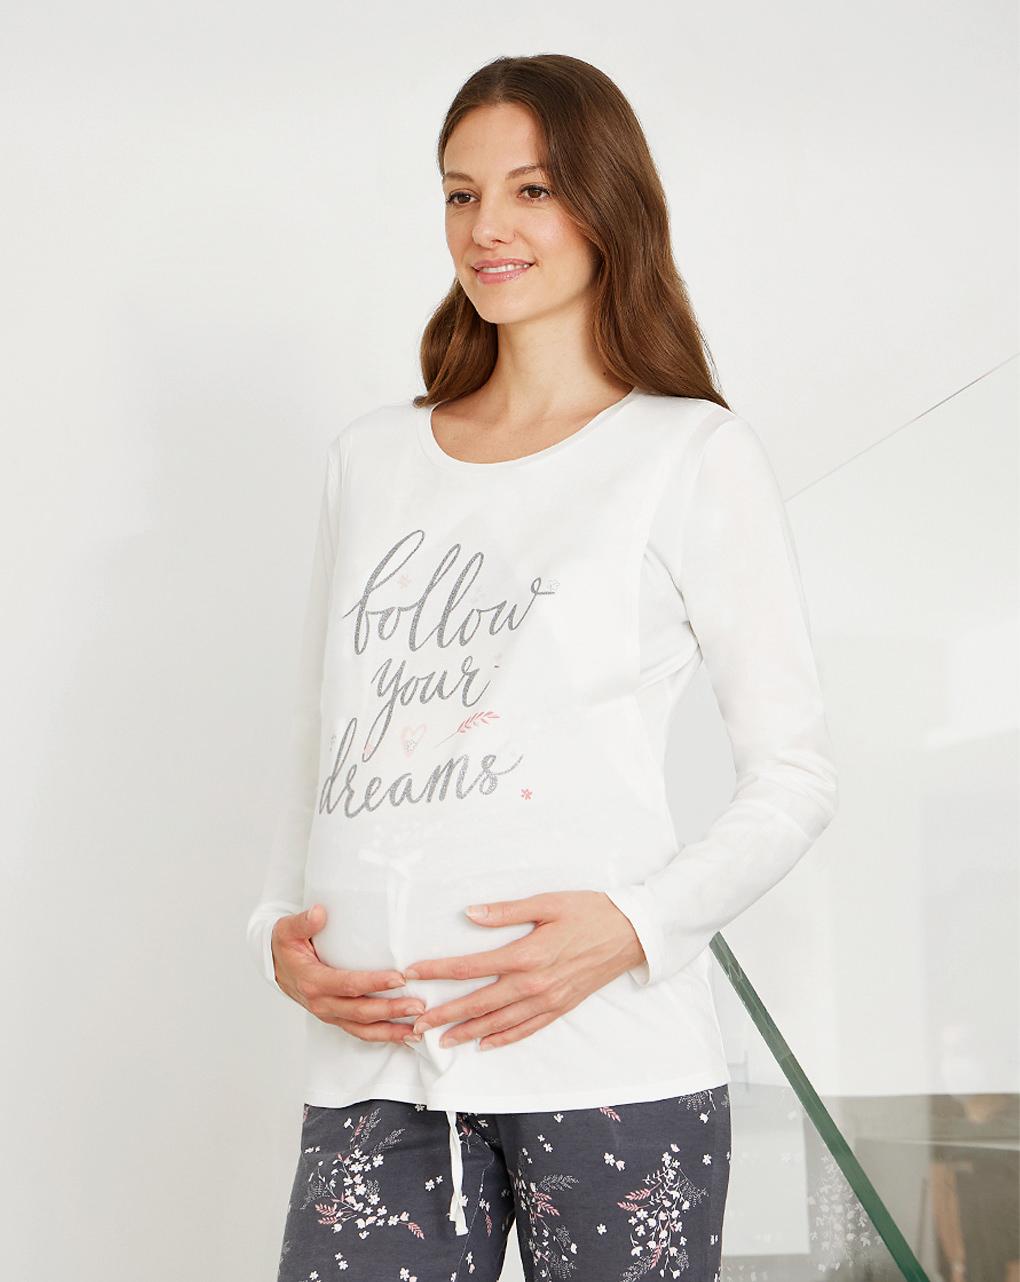 Pigiama premaman allattamento follow your dreams - Prénatal